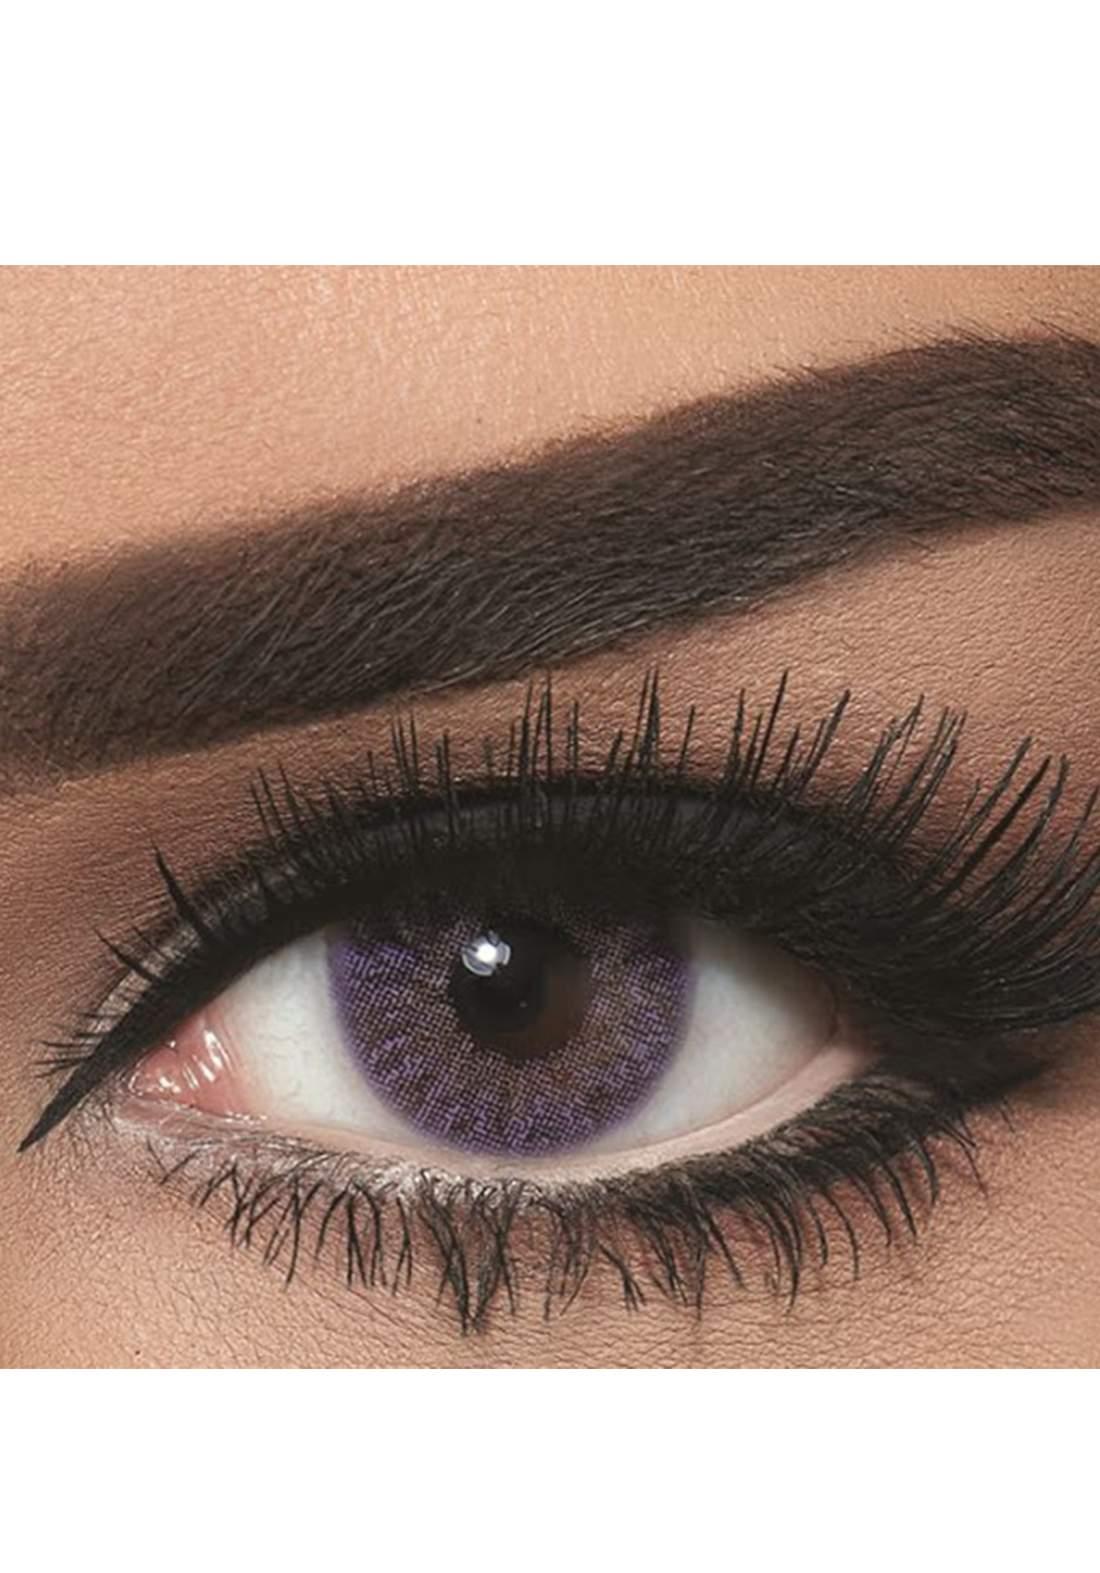 Bella Classic 301022 Contact Lenses 3 Months Use Natural - Violet No.23 عدسات لاصقة